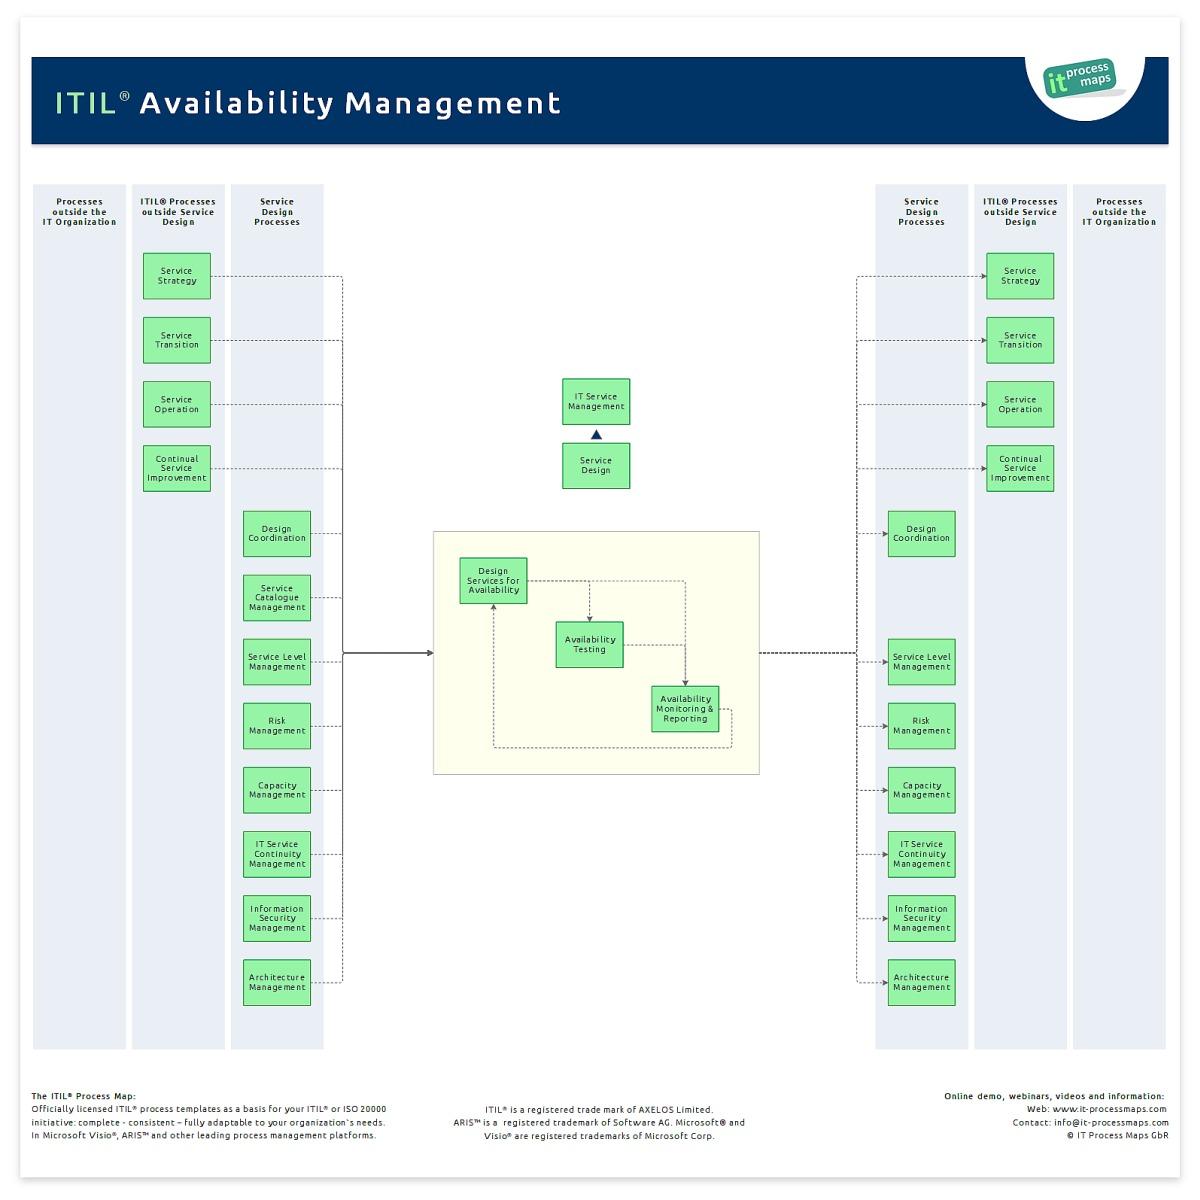 Bodegakual availability management process diagram availability management process diagram pooptronica